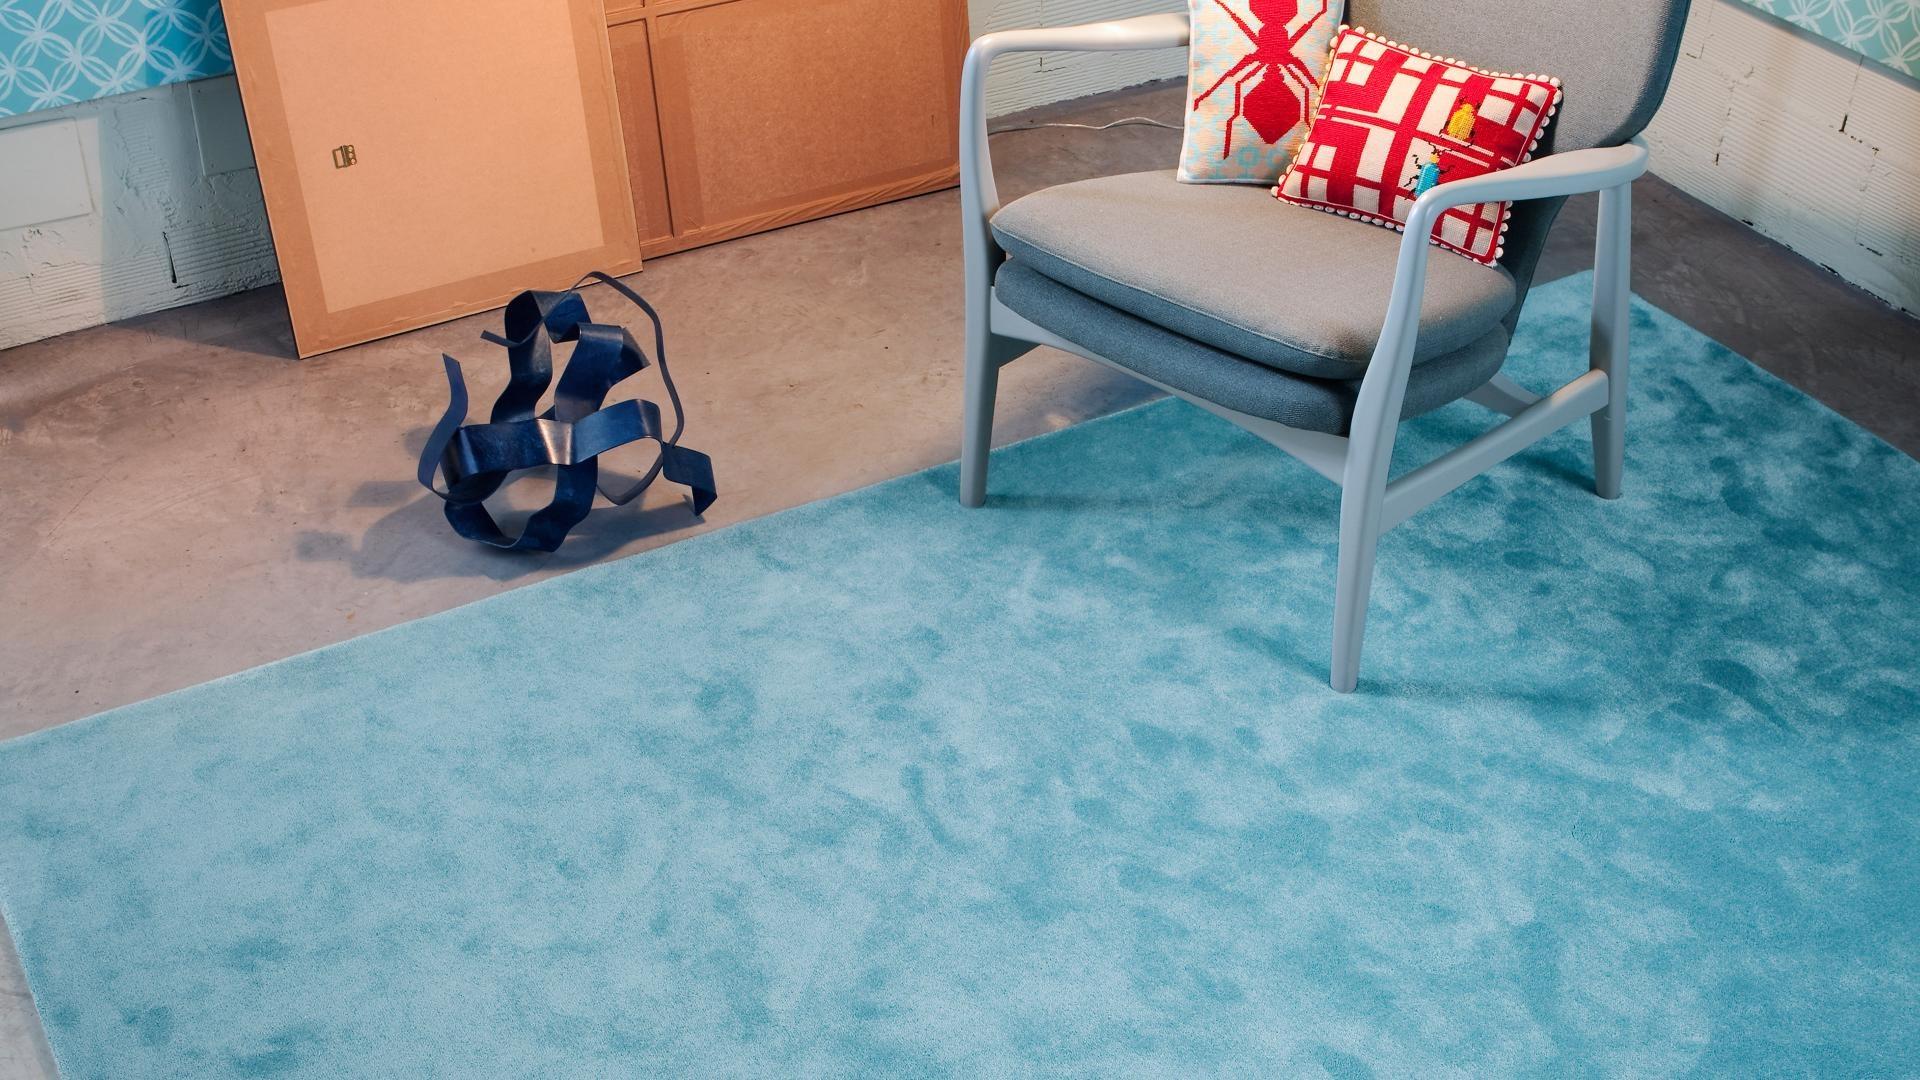 Alfombras a medida kp finest alfombras kp a medida muestras smart strand with alfombras a - Alfombras sant cugat ...